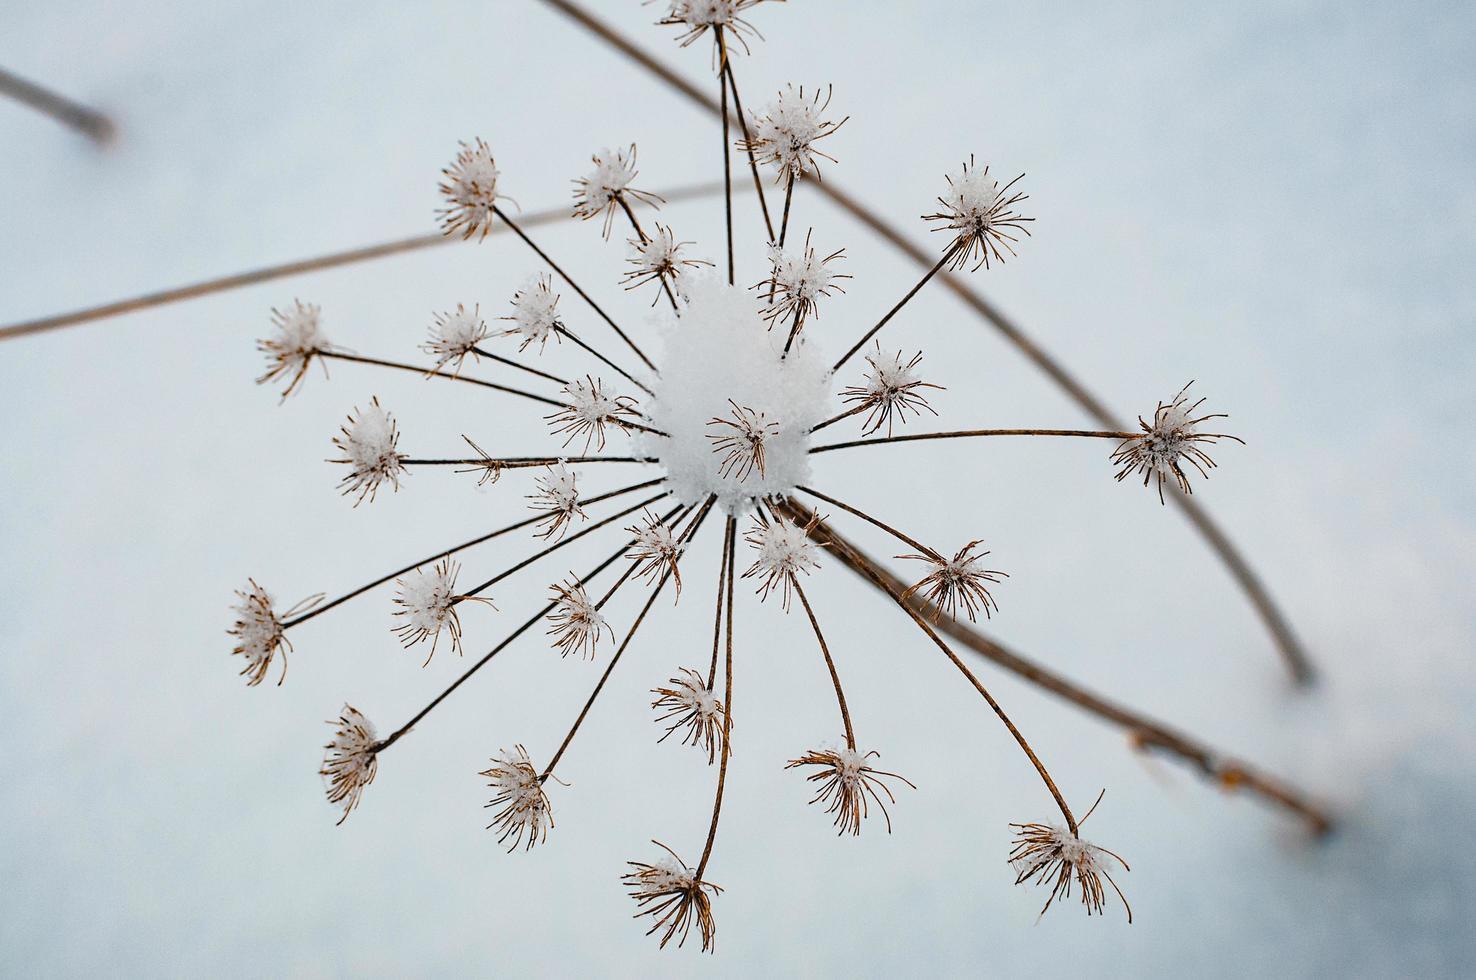 vilt torrt gräs mot snön foto